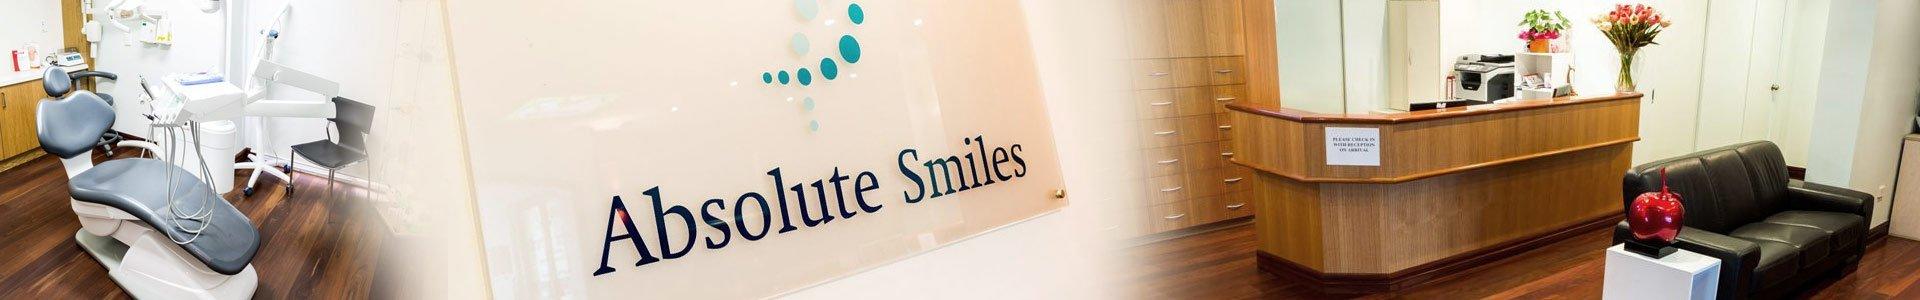 absolute smiles dental practice